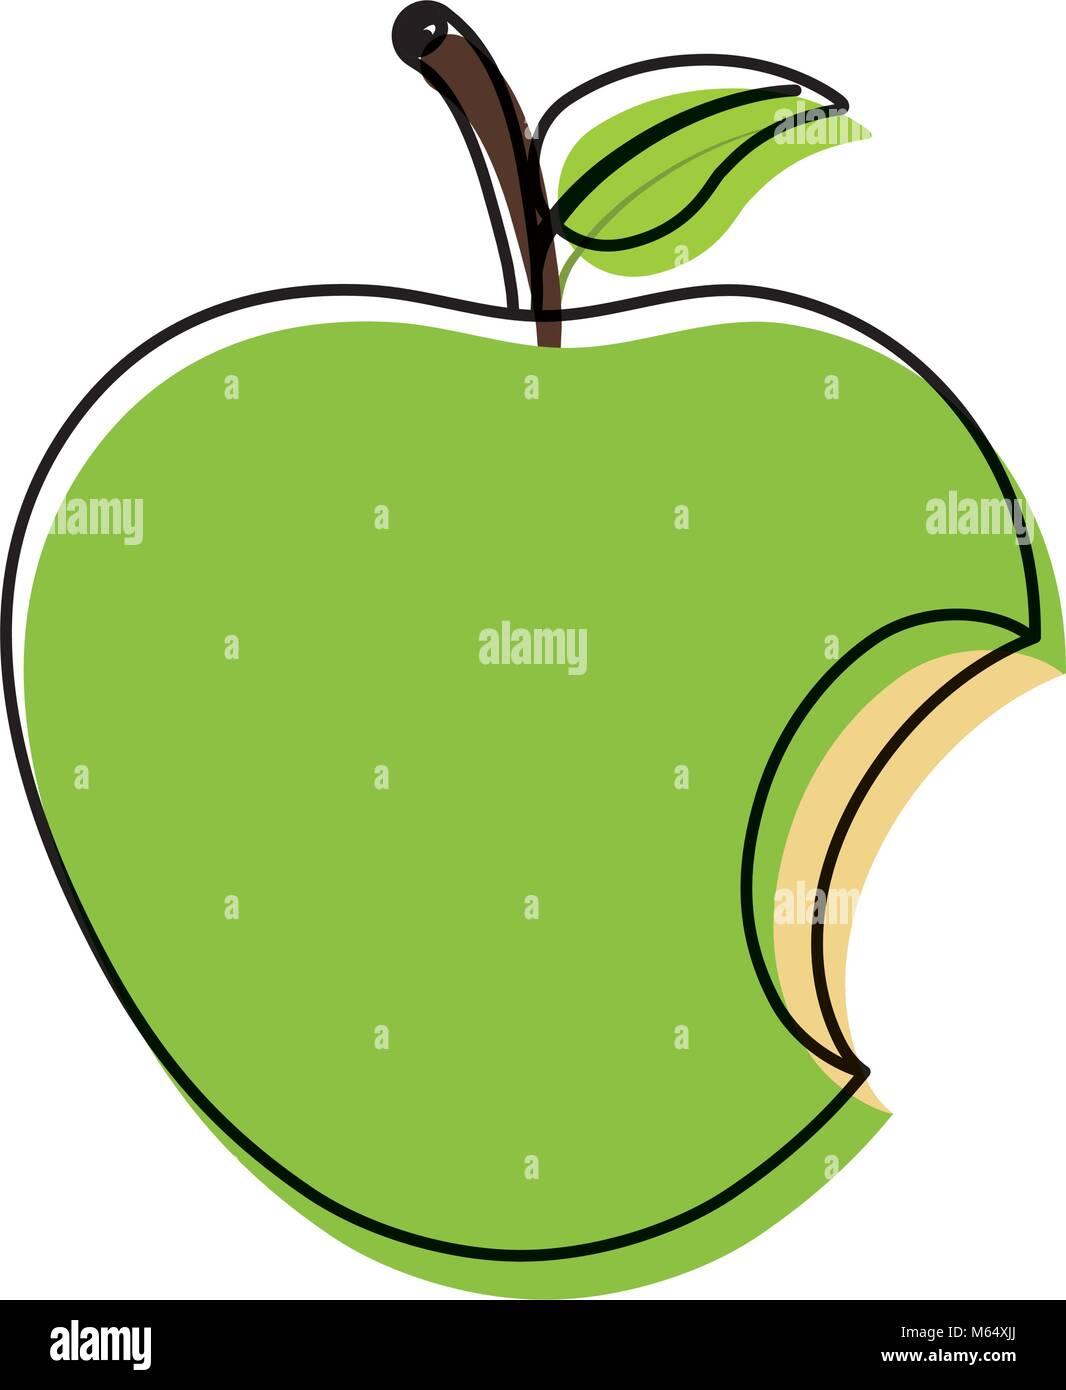 Bitting Apple Symbol Vektor Abbildung Bild 175900330 Alamy